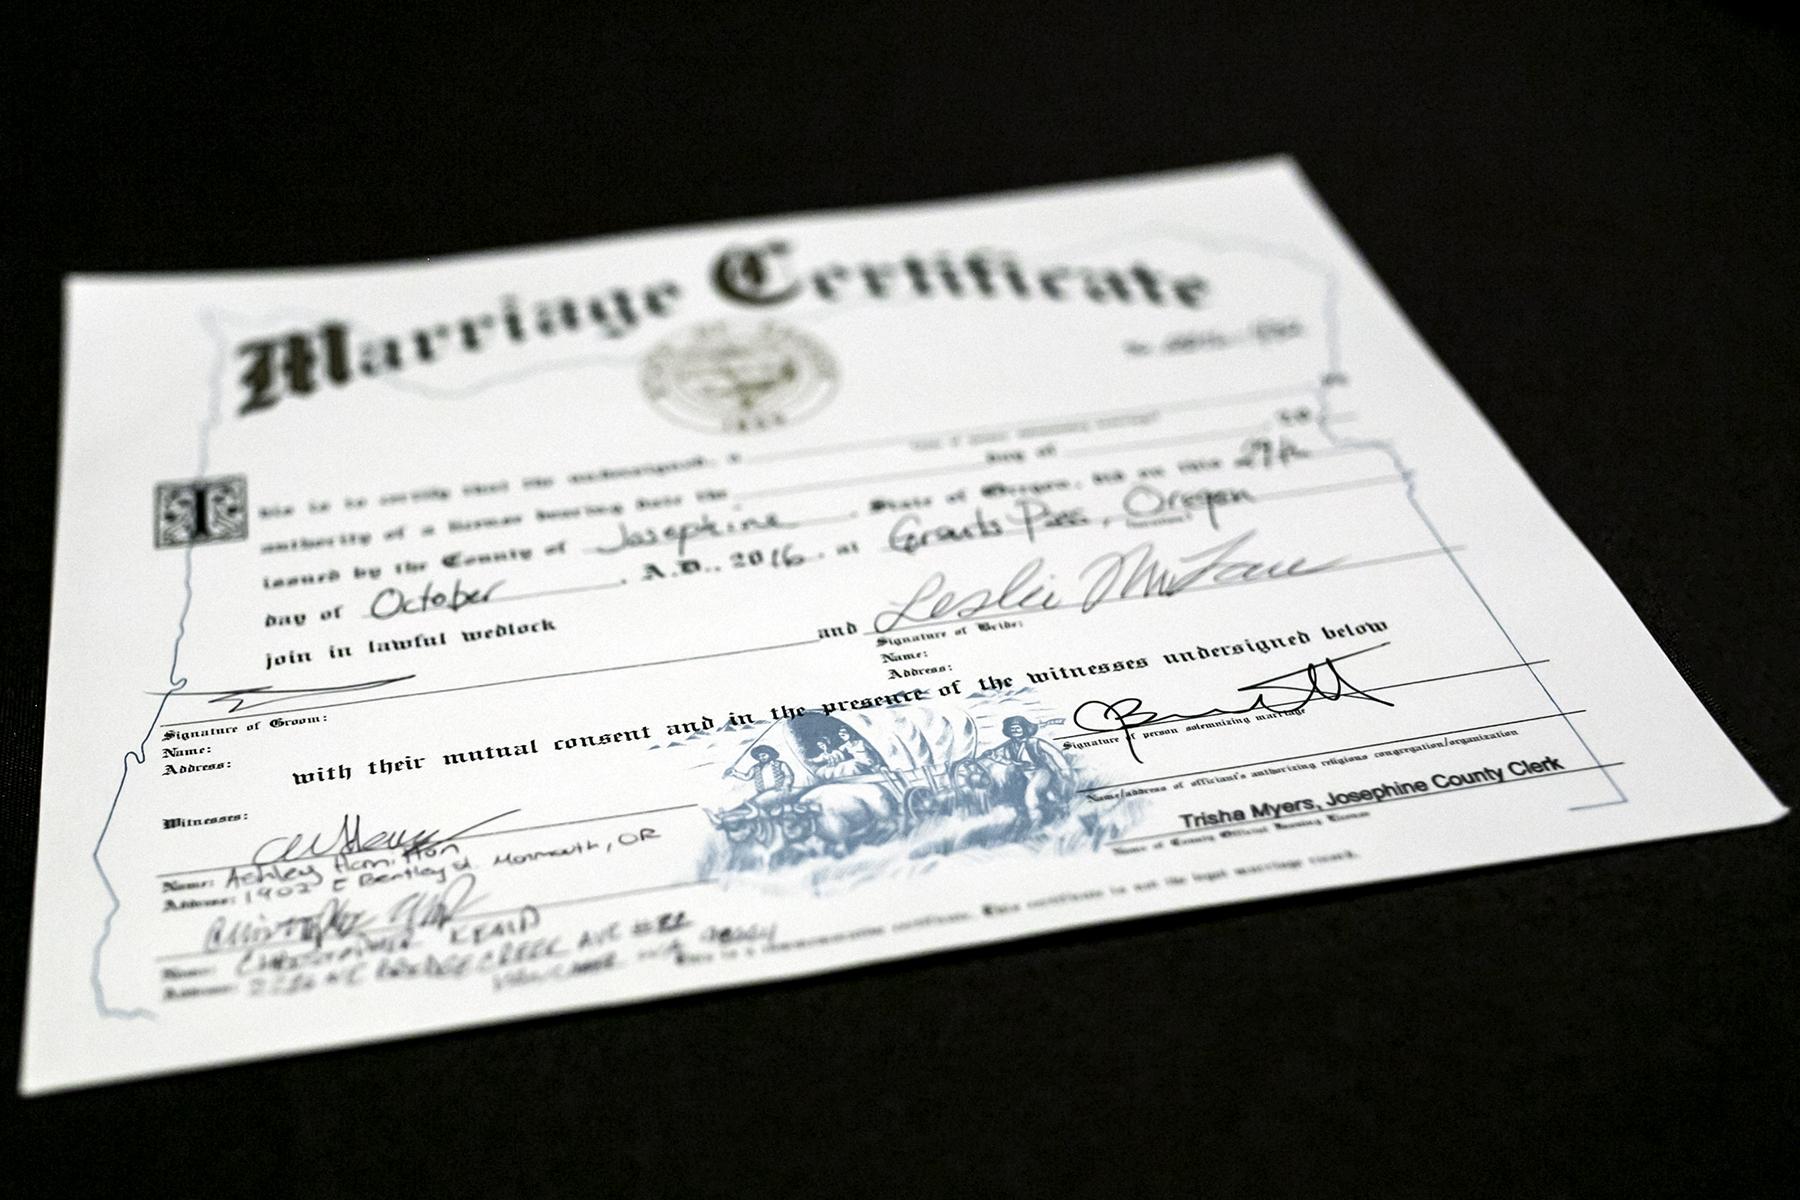 Leslie-Certificate-1200